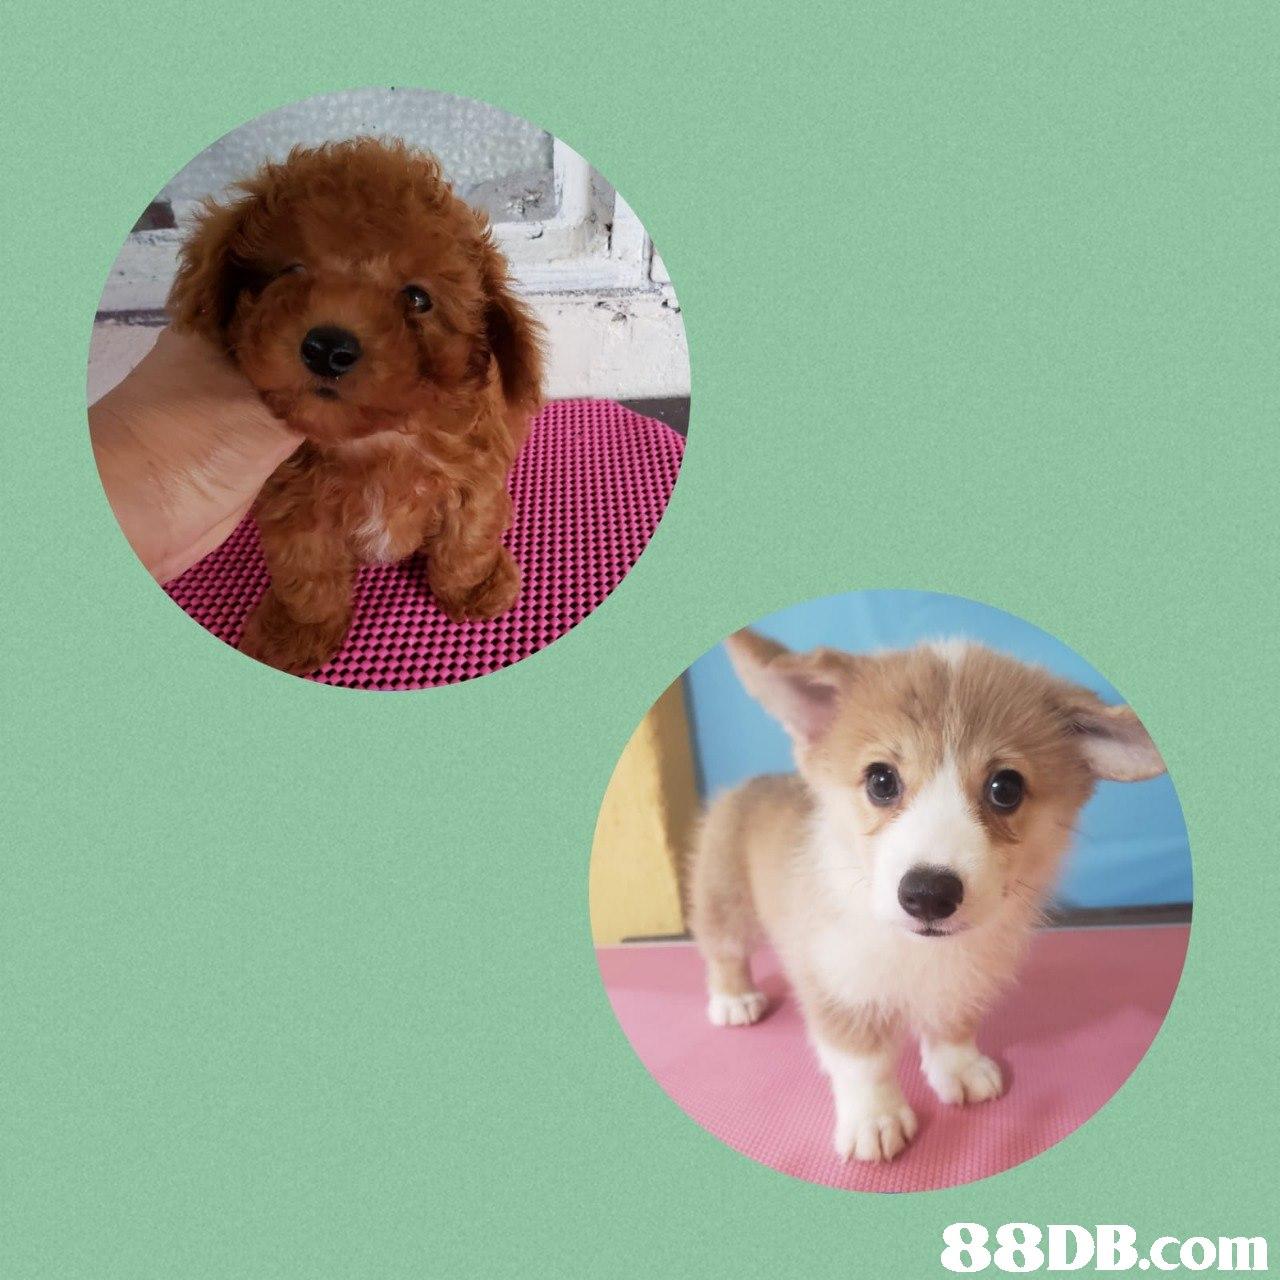 dog,dog like mammal,dog breed,puppy,dog breed group